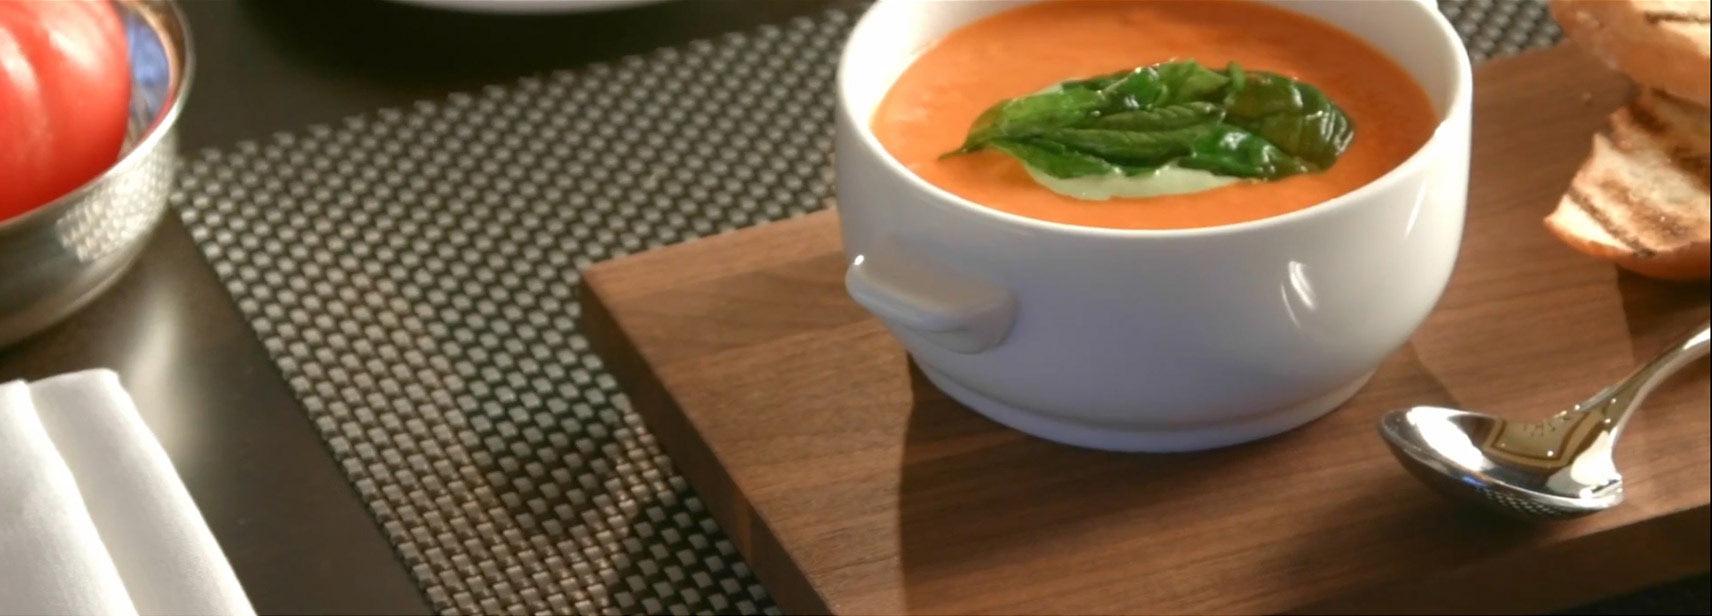 Soup - Hawthorn Grill Summerlin Las Vegas Restaurant